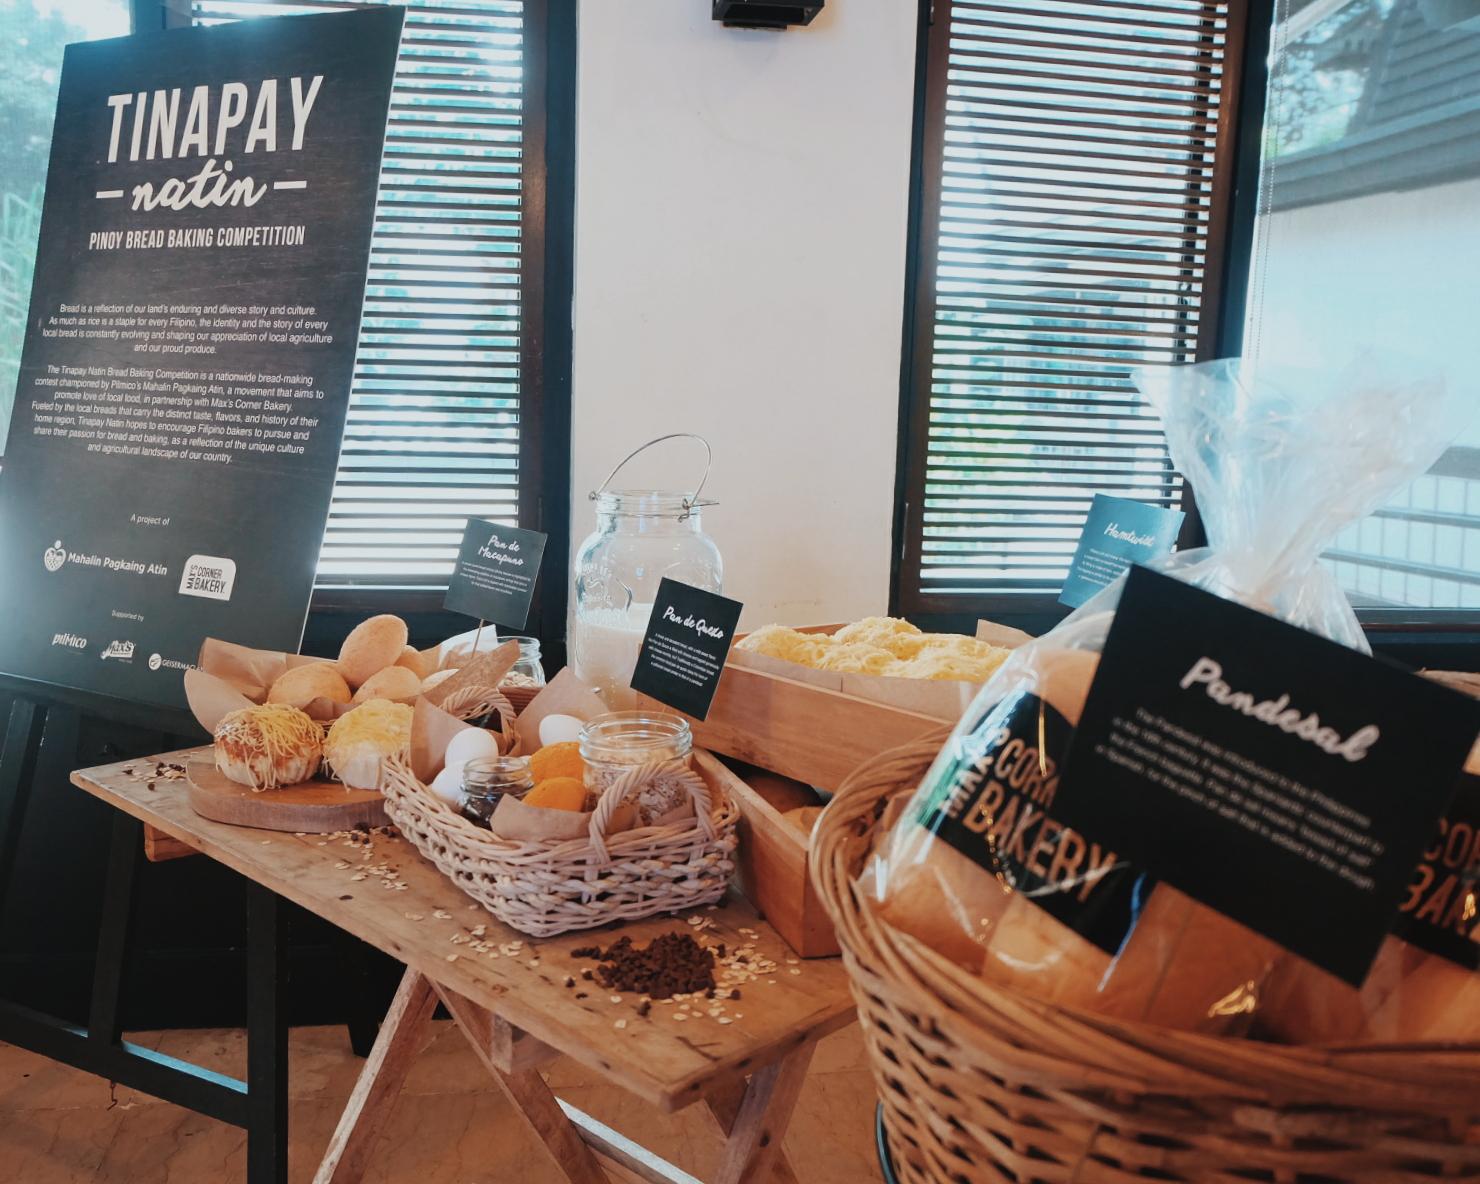 Tinapay Natin Bread Baking Competition